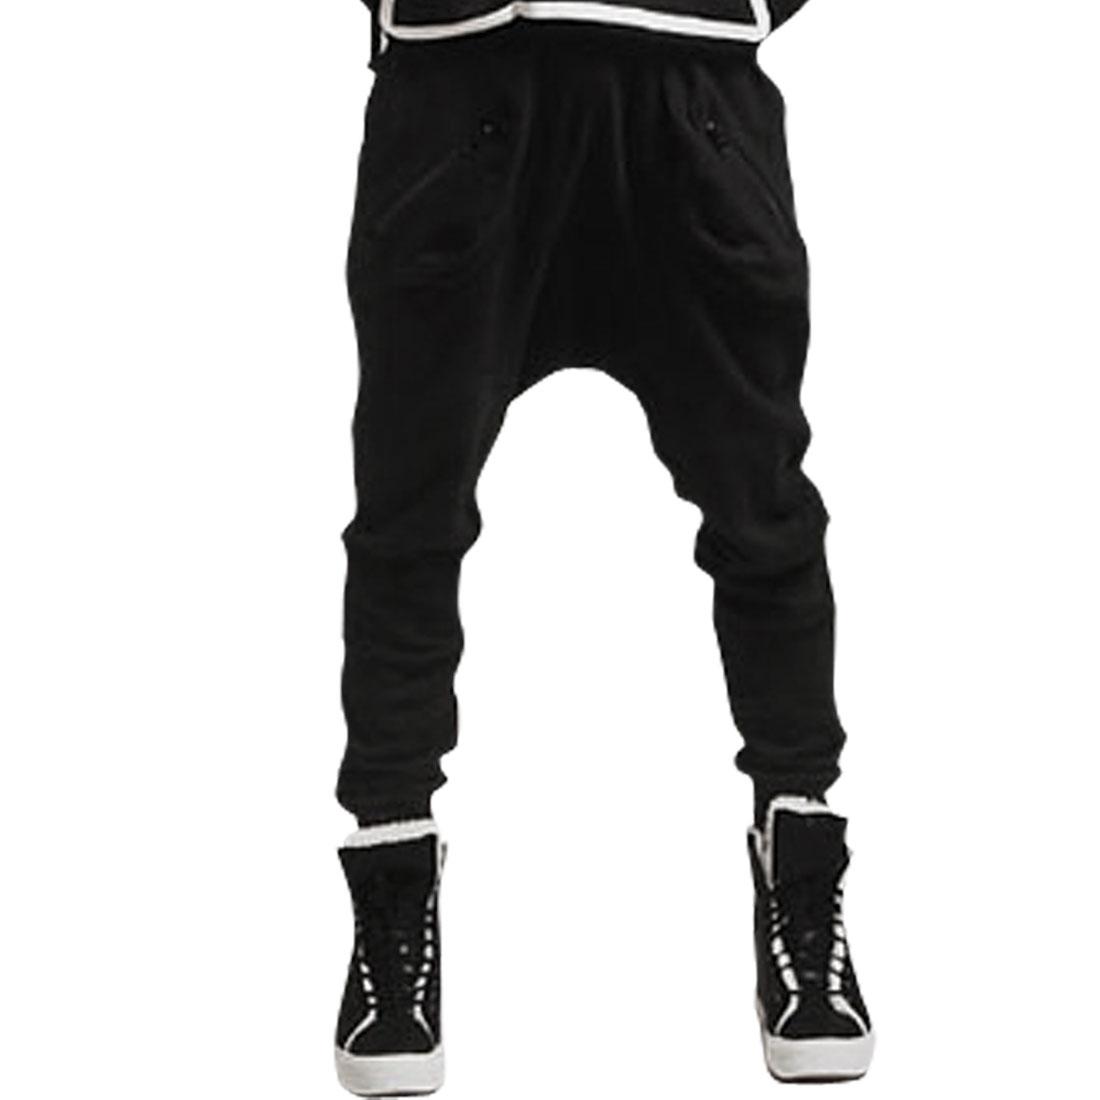 Man Drawstring Zipper Decor Hip Pockets Long Leisure Trousers Black W34